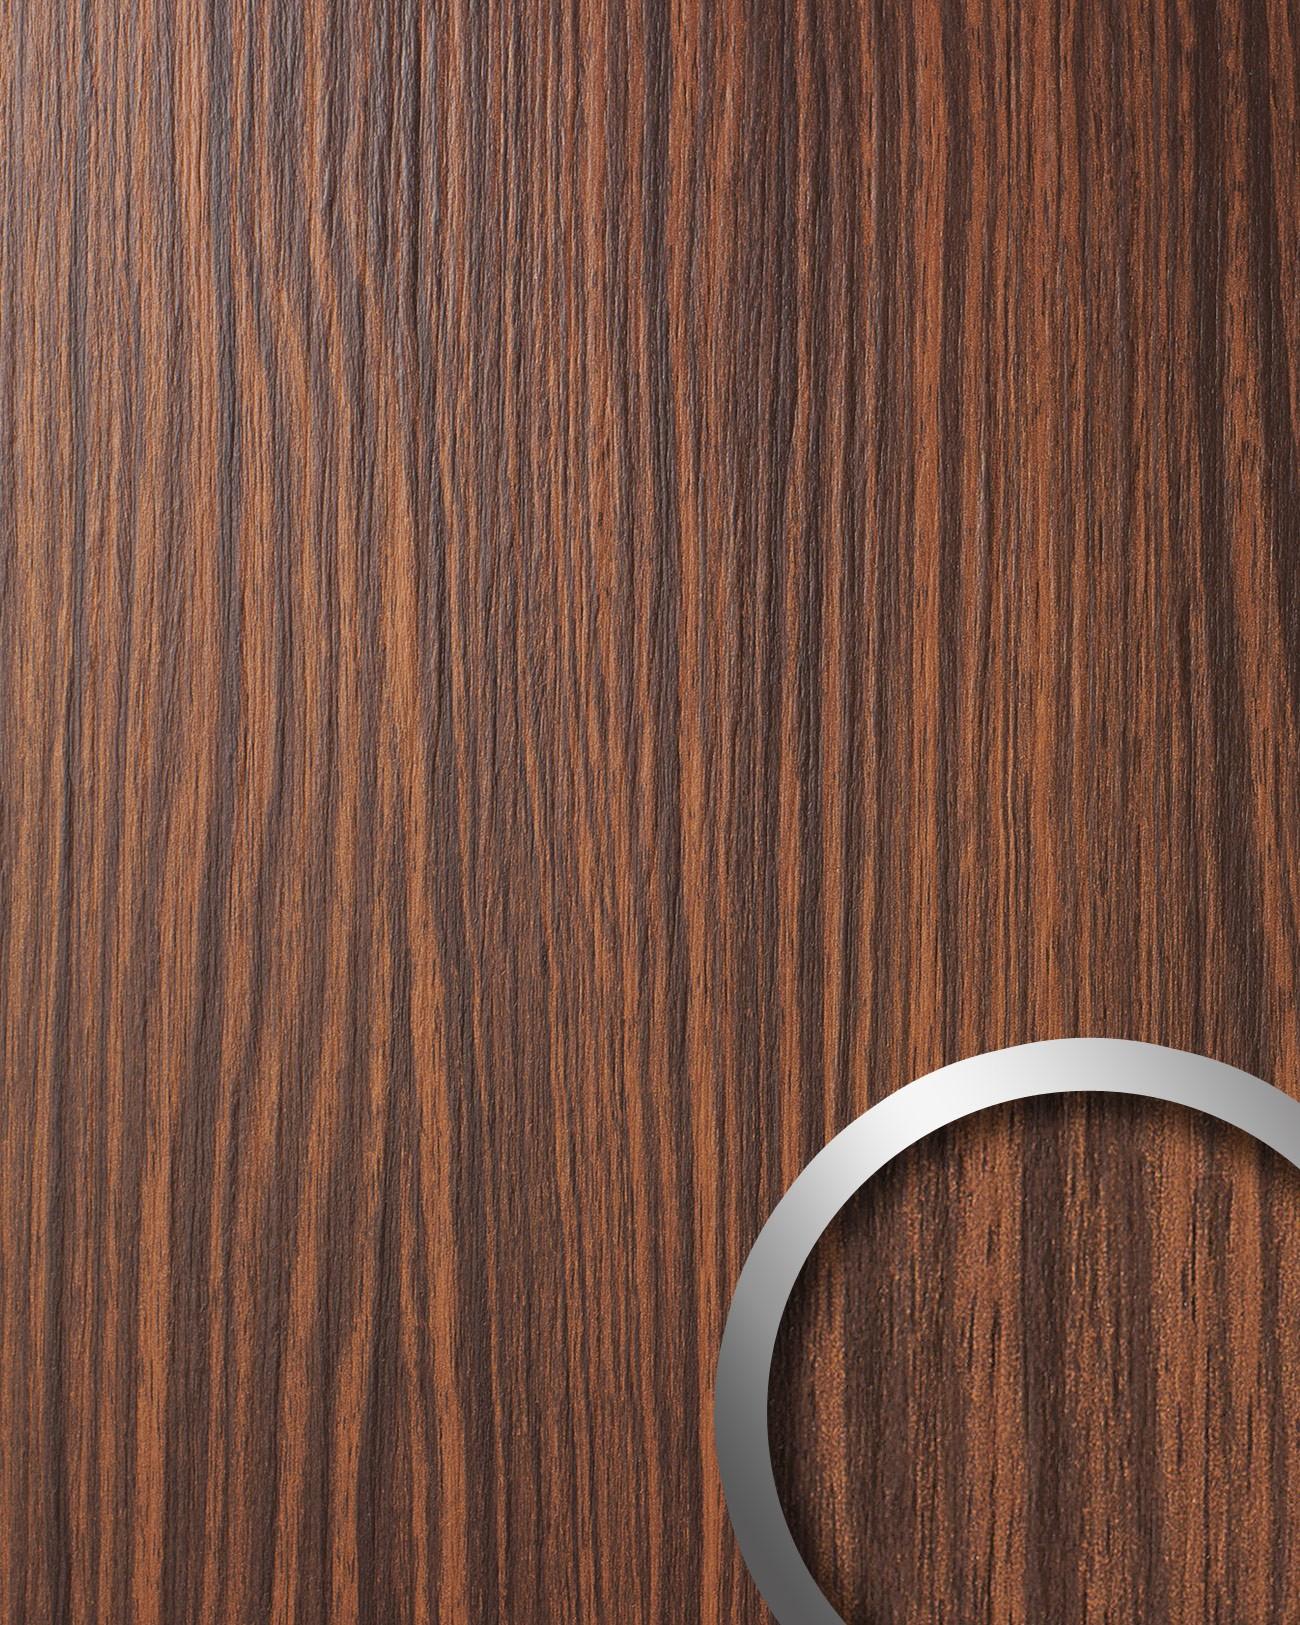 Wandverkleidung Holzoptik wandverkleidung wandpaneel holzoptik wallface 12441 wood makassar